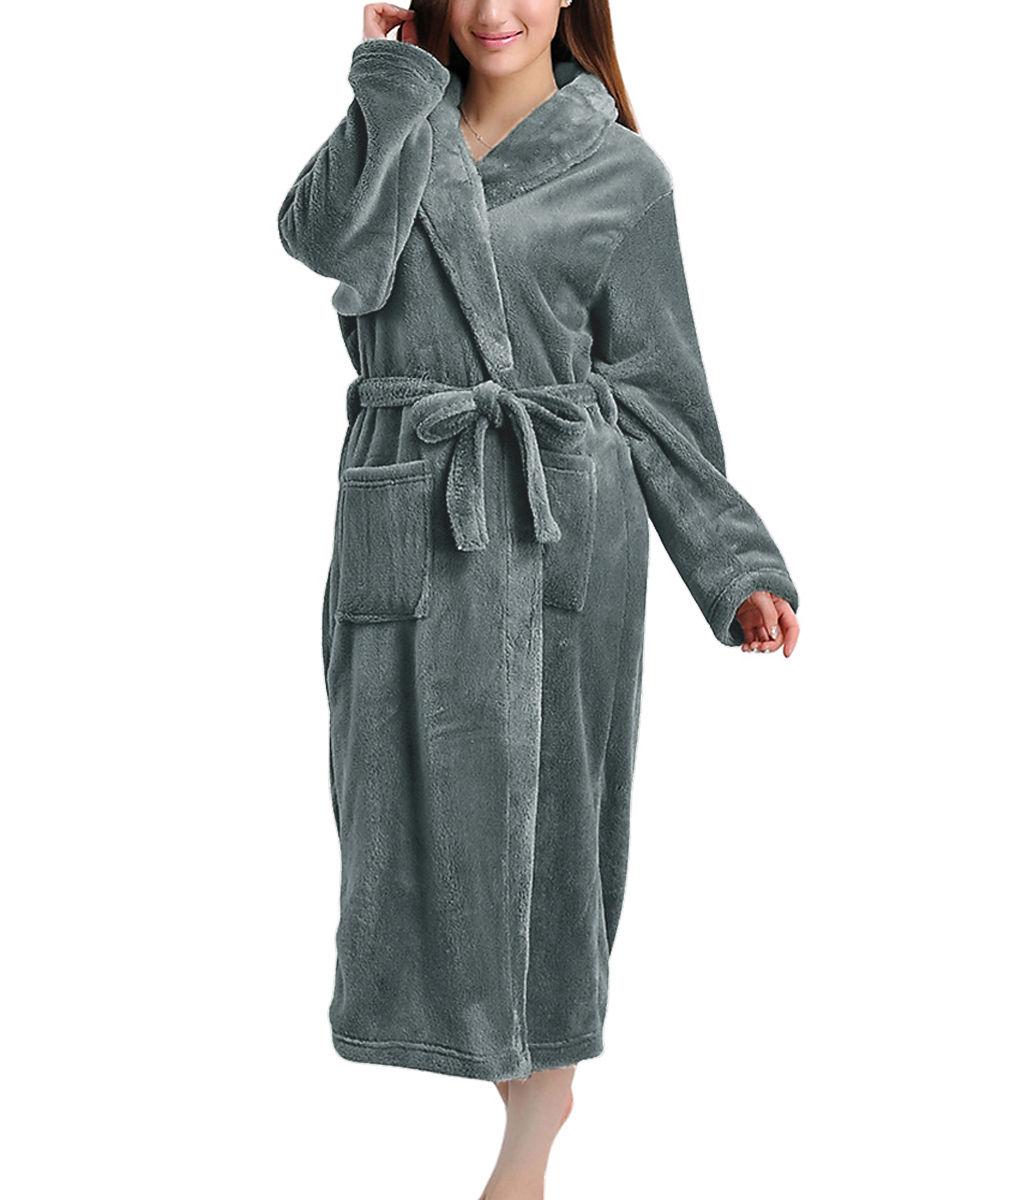 Unisex Women Men Fleece Shawl Collar Long Sleeve Bathrobe Dressing ...